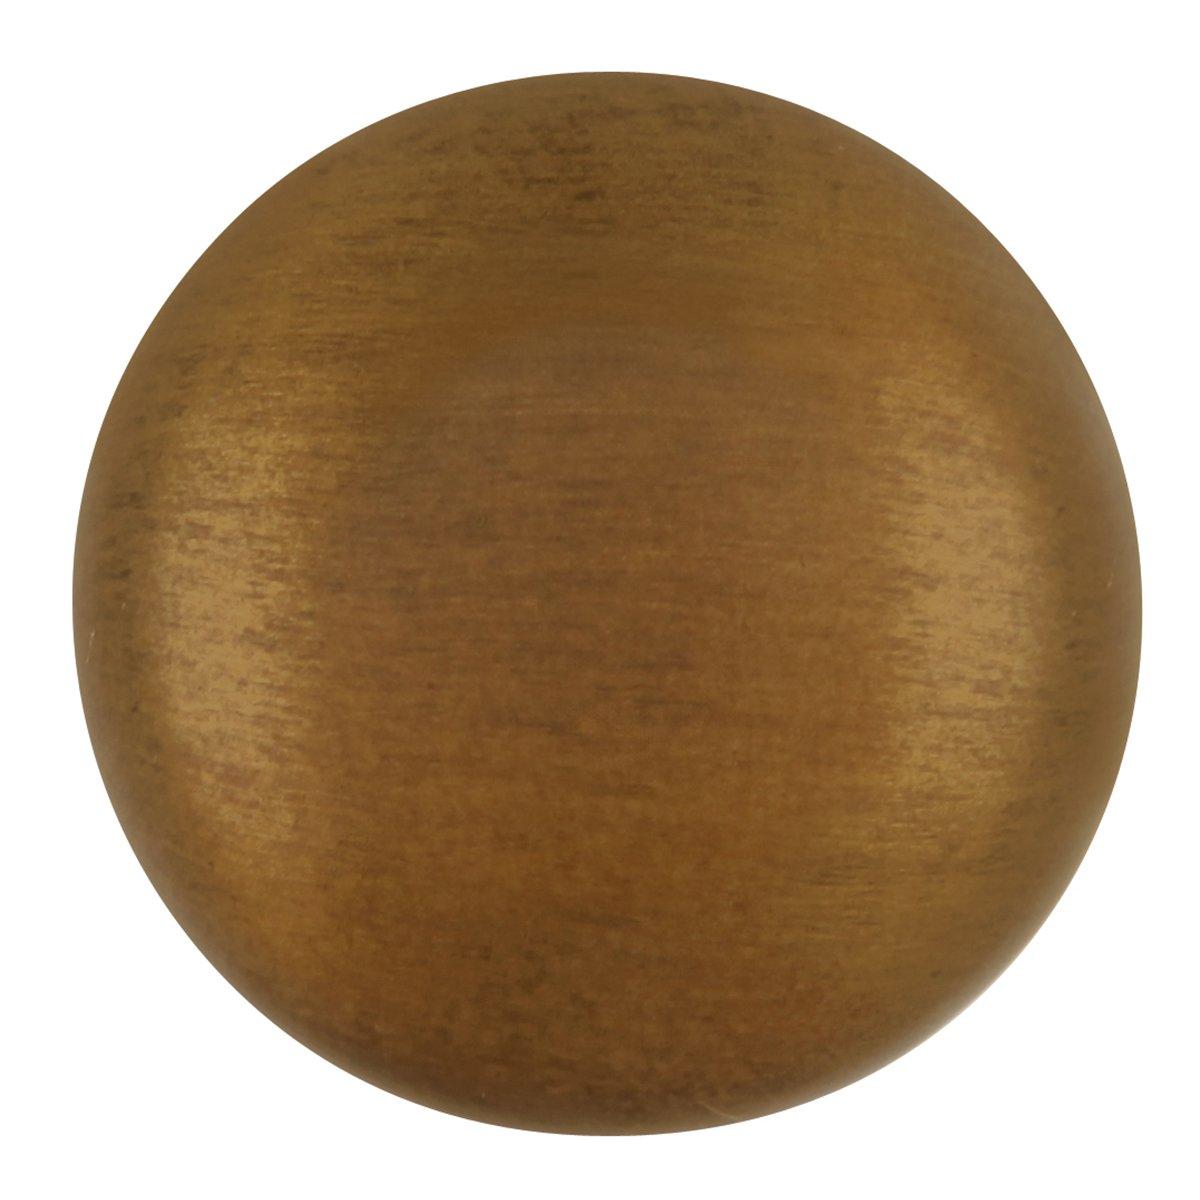 Hickory Hardware P6091-AB Value Collection Knob 1-1//4 Diameter Antique Brass Finish